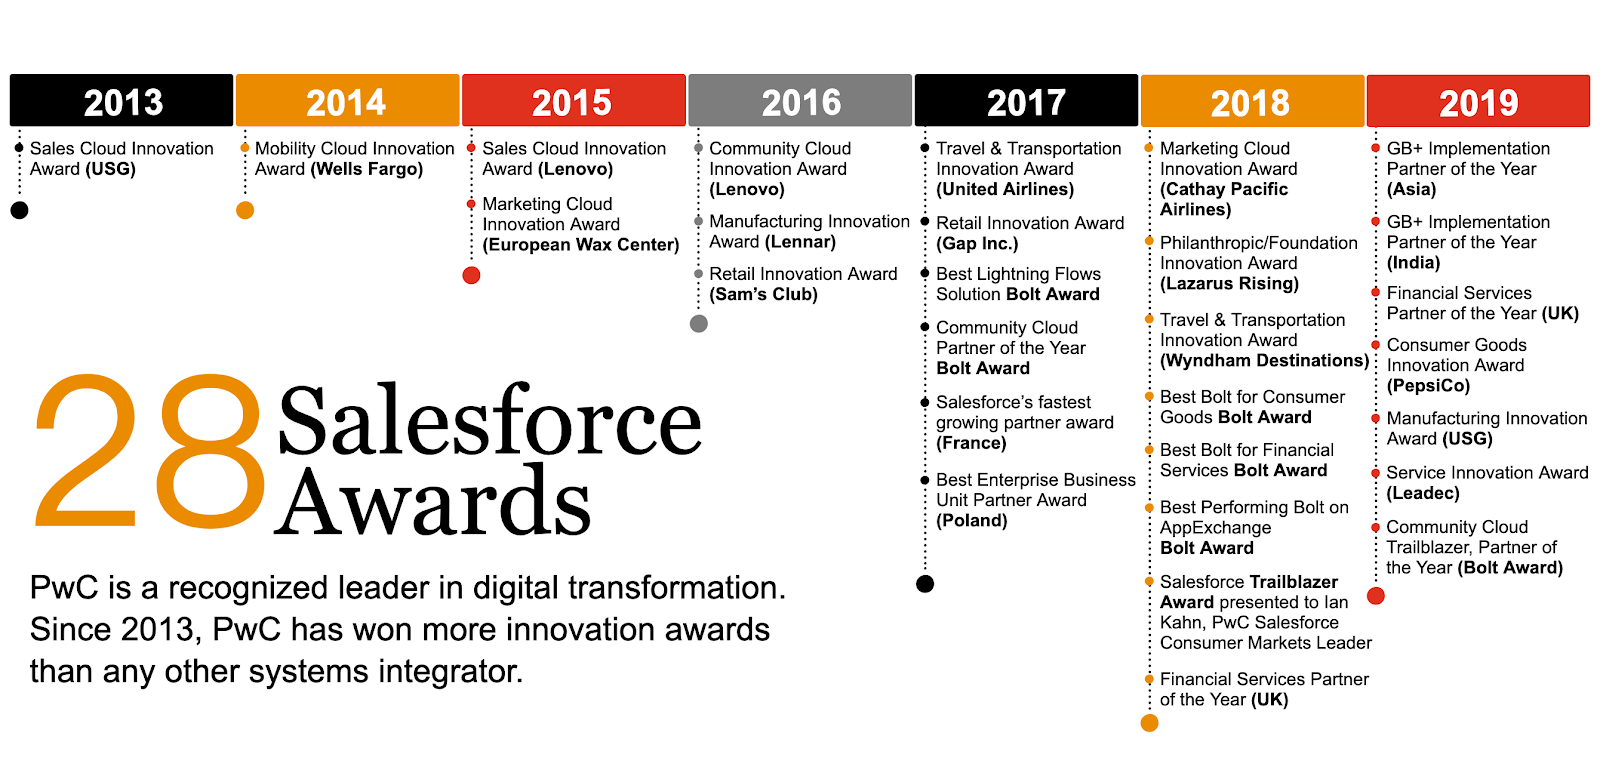 PwC 也透過導入 Salesforce CRM 系統,進行全球的數位化轉型